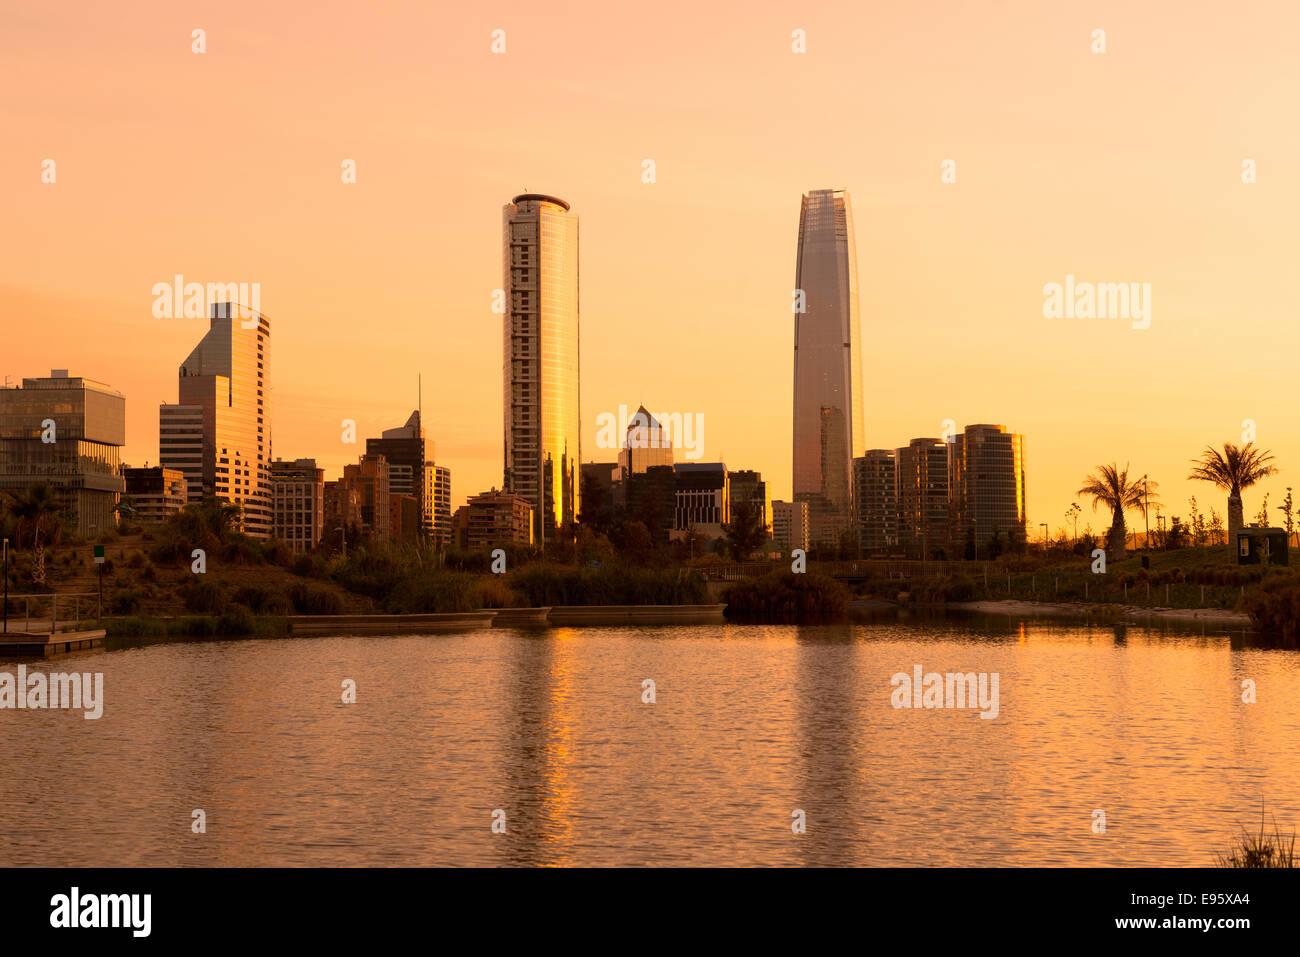 Skyline of buildings at Las Condes district, Santiago de Chile - Stock Image